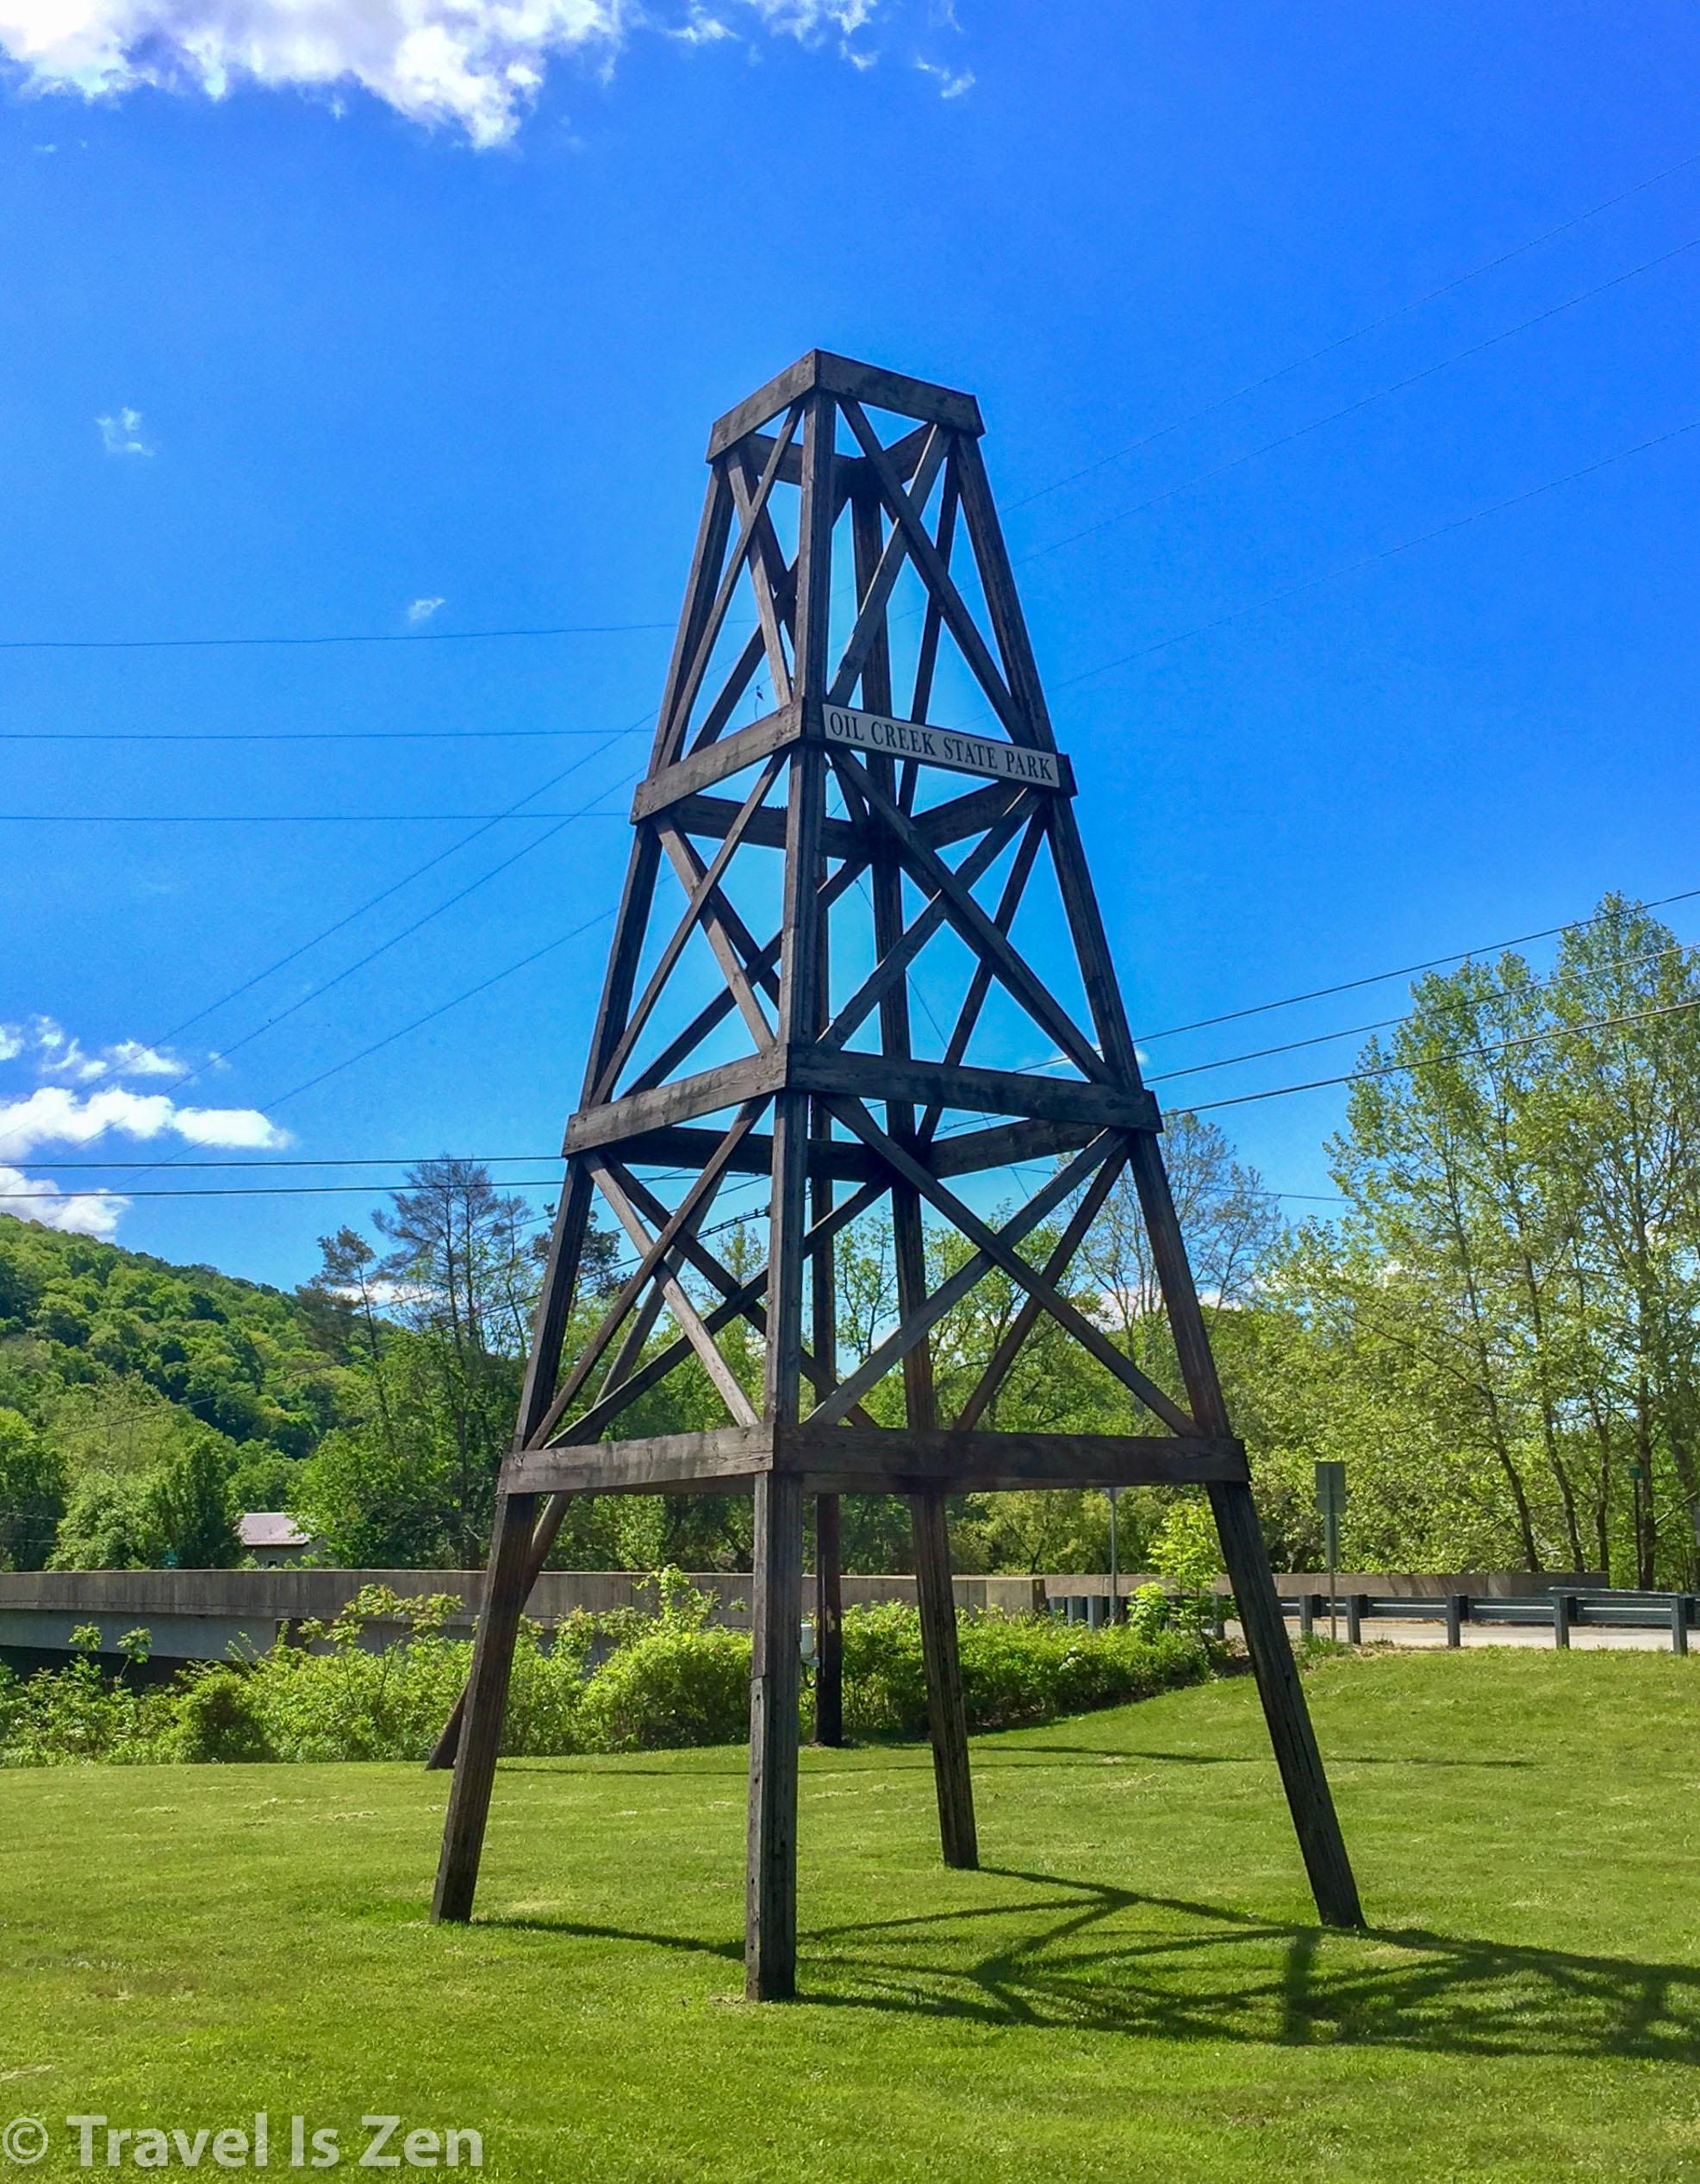 Oil derrick at Oil Creek State Park, PA